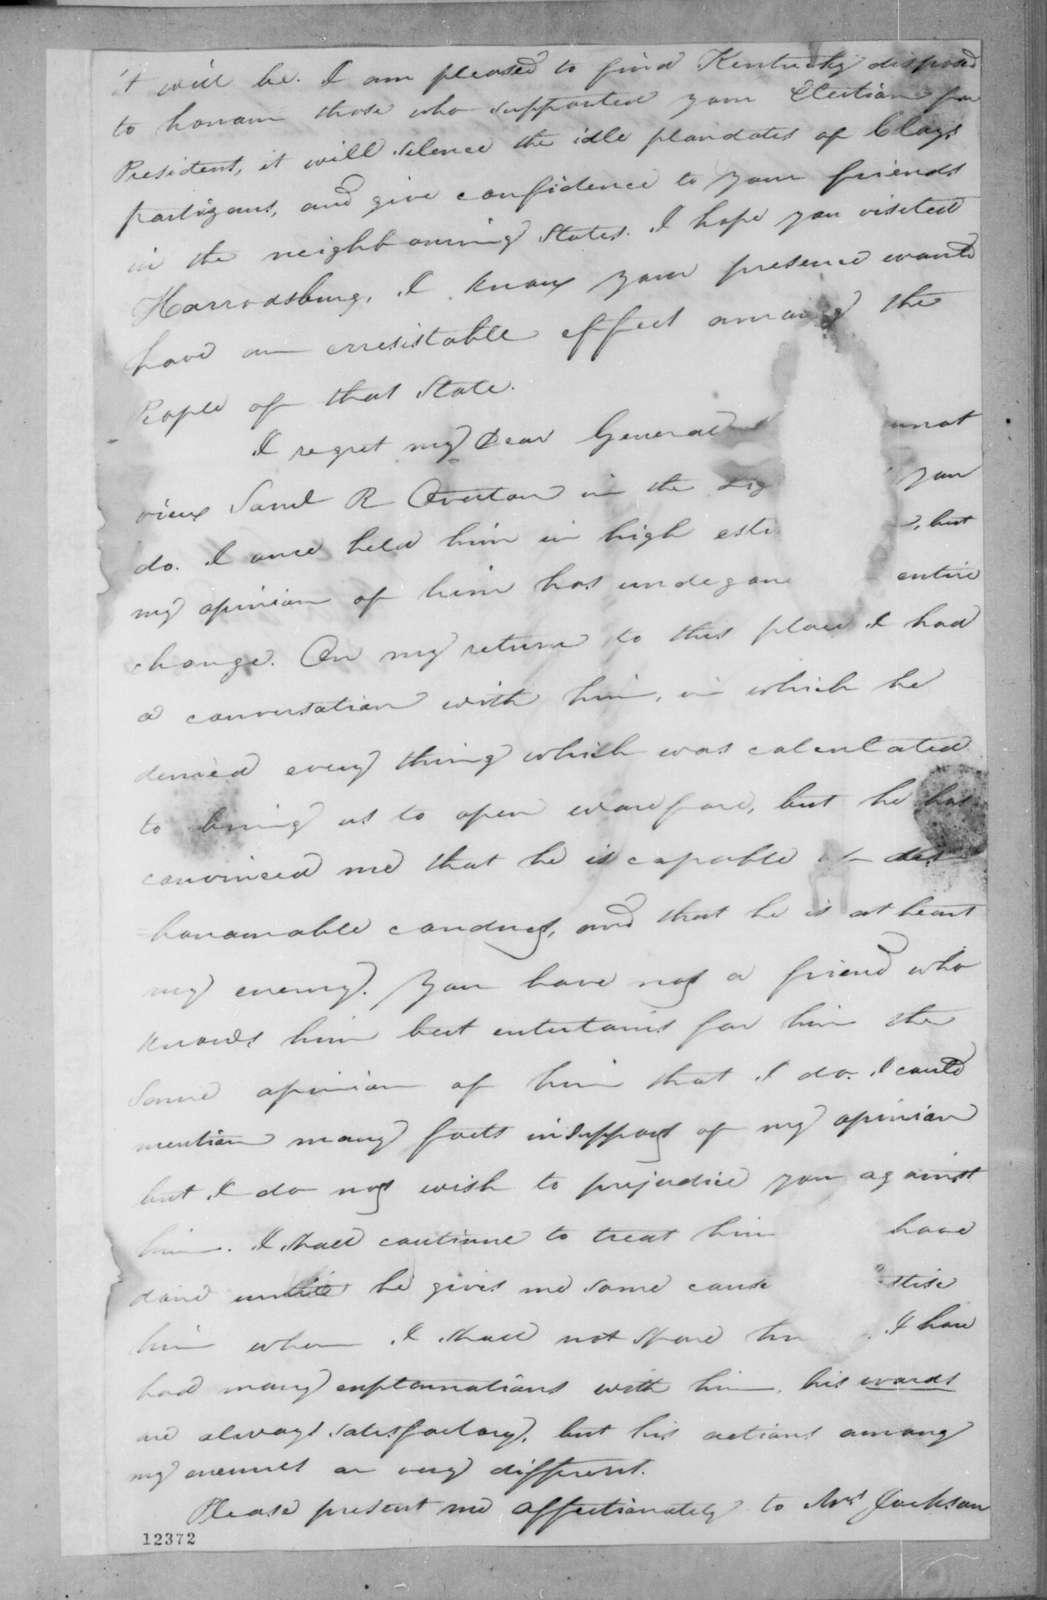 Richard Keith Call to Andrew Jackson, September 23, 1825